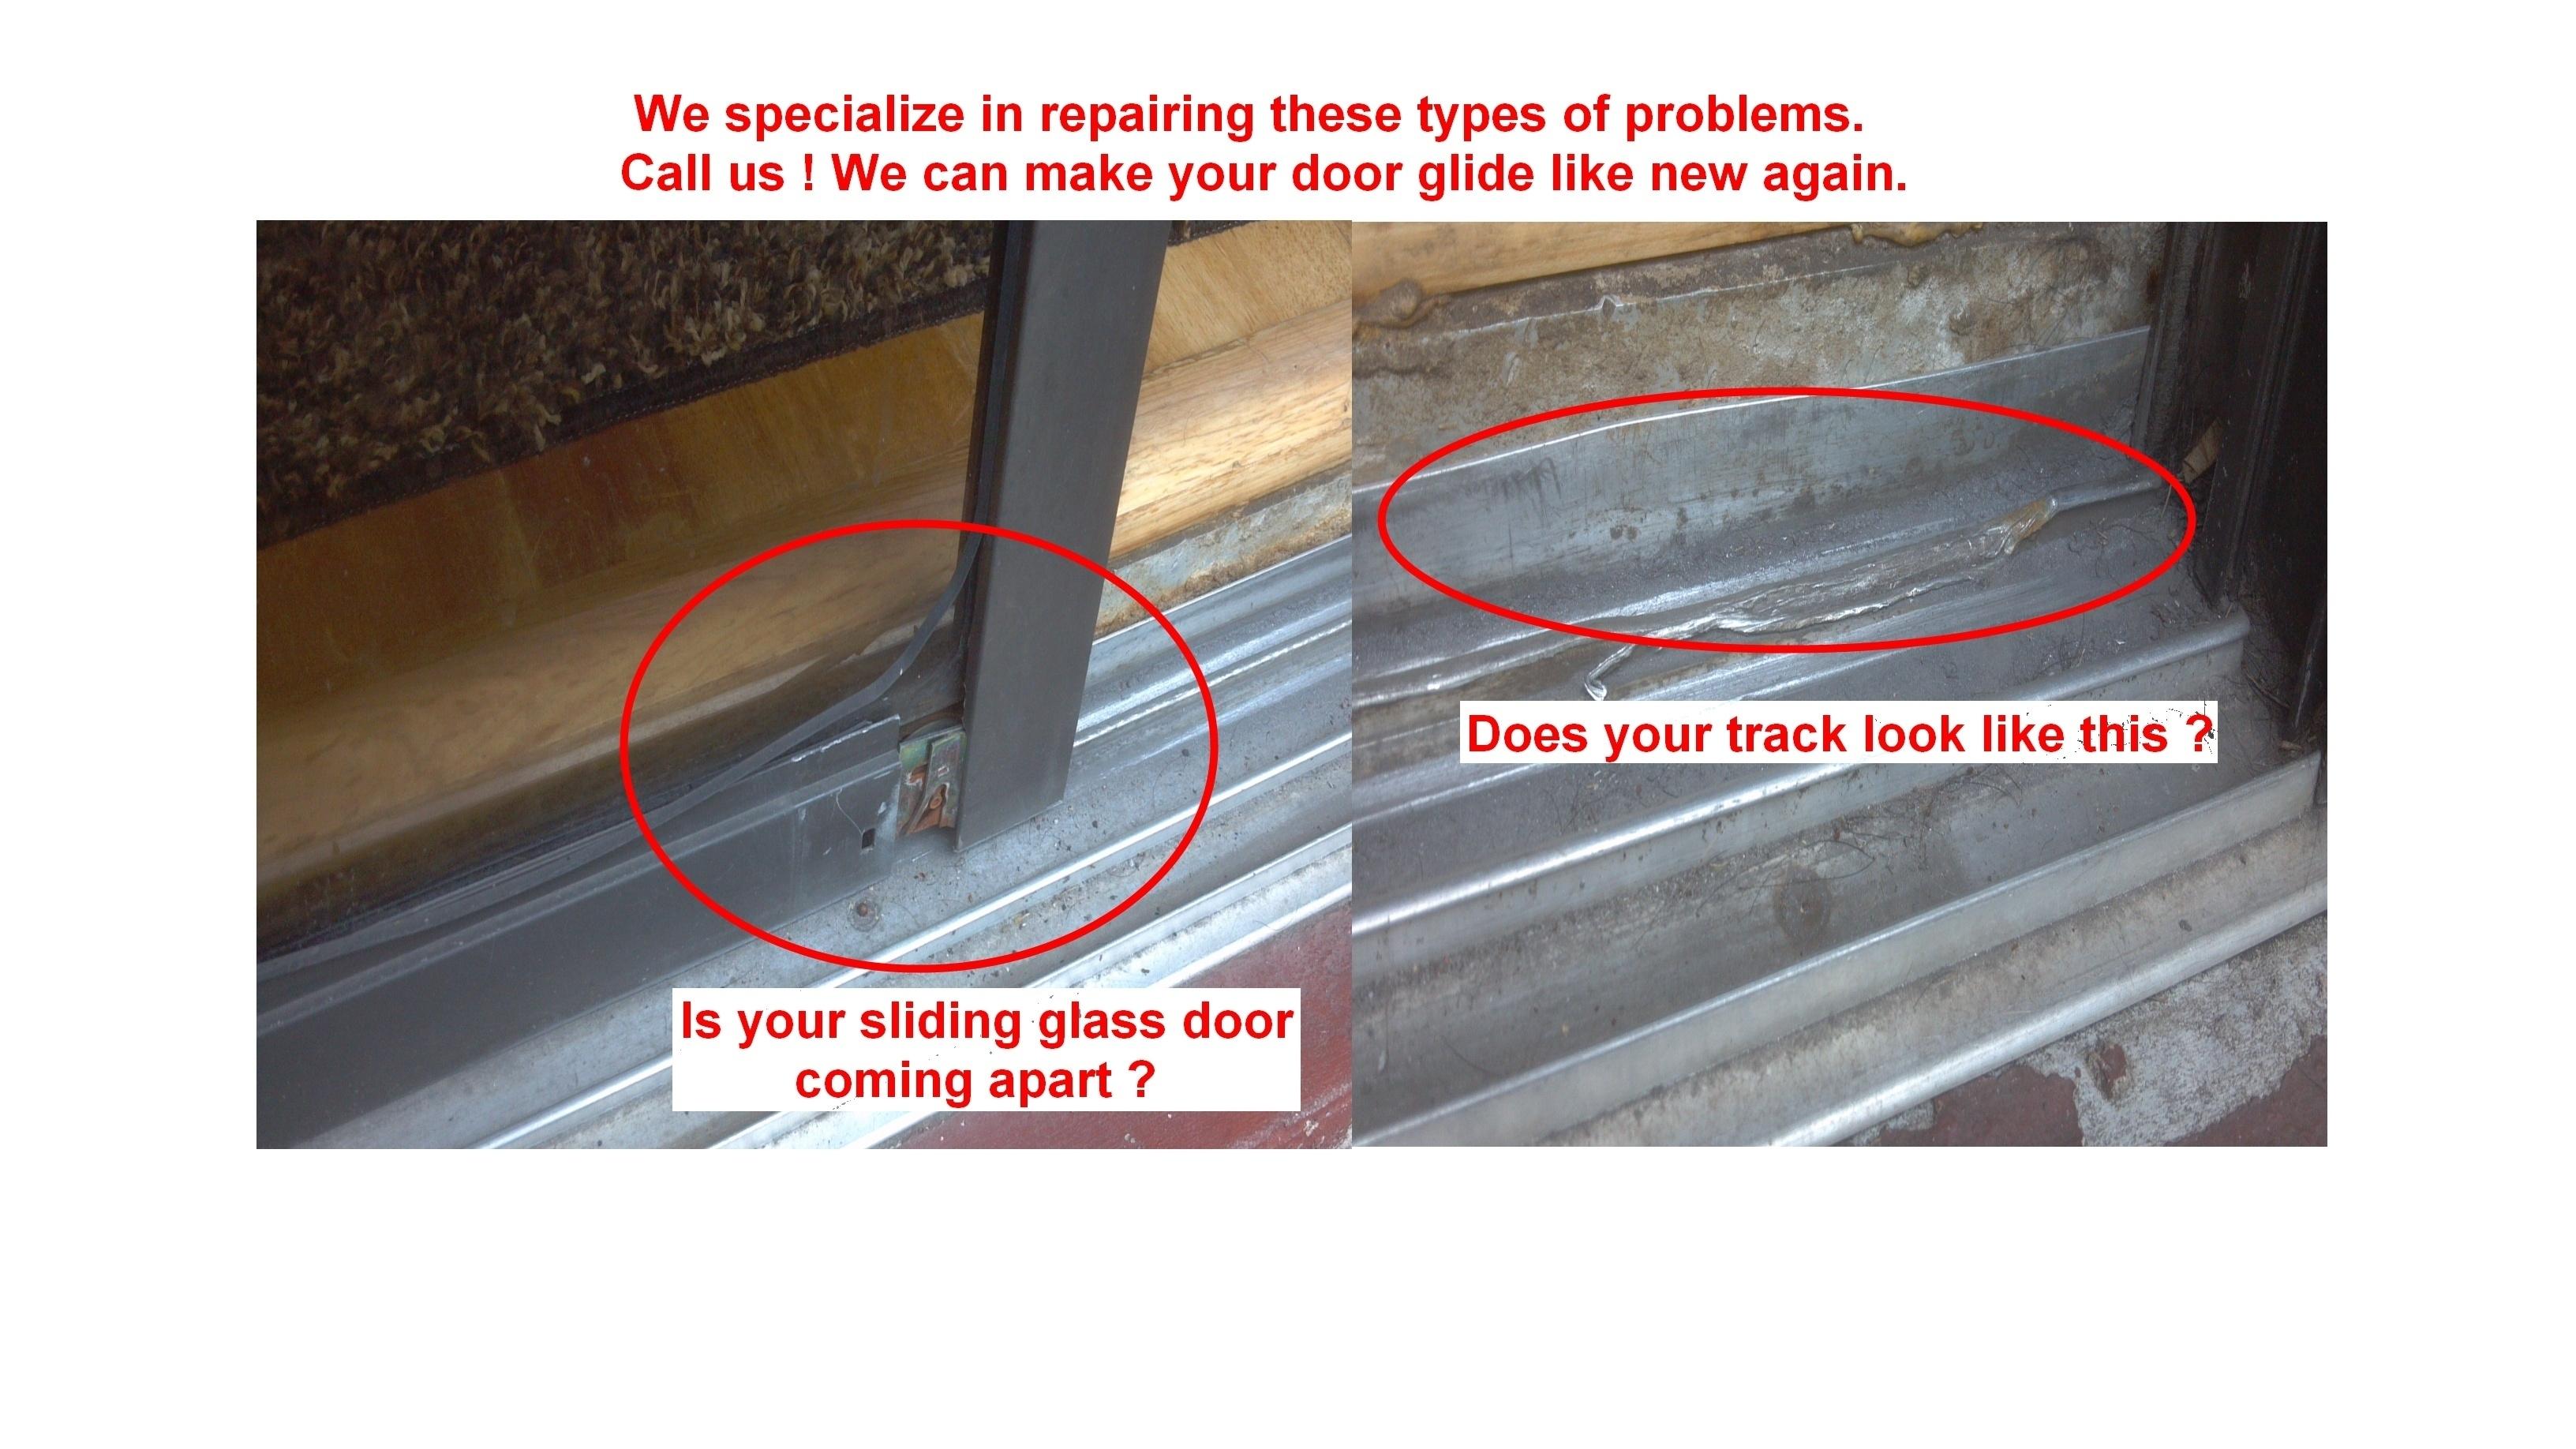 Fixing Sliding Glass Doors Rollers3264 X 1836